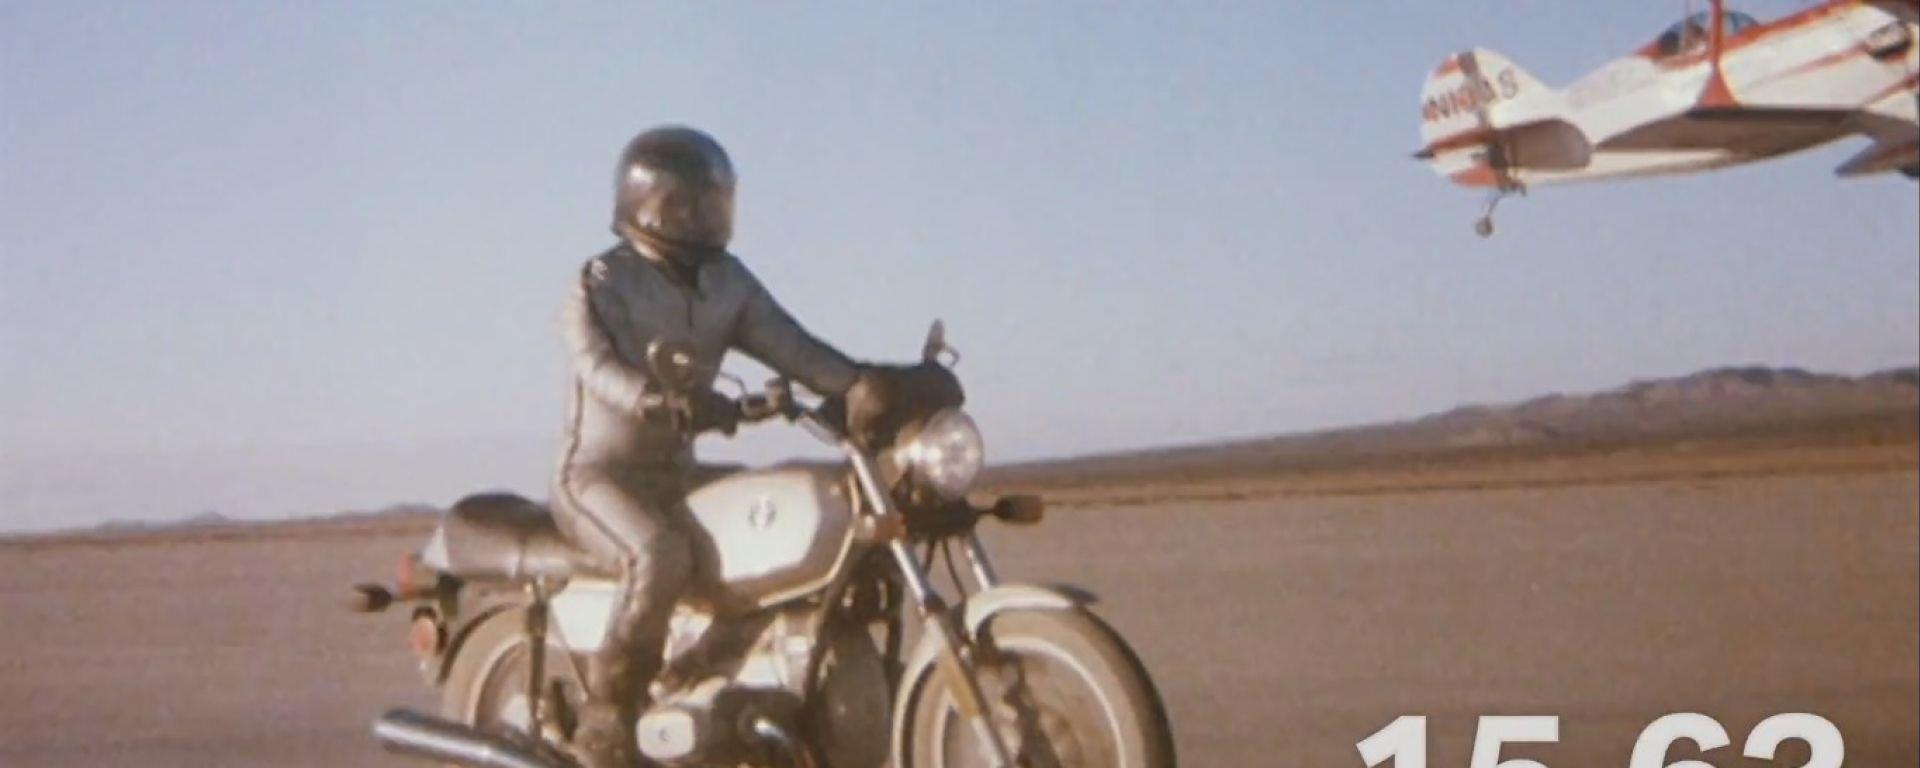 BMW Motorrad festeggia 90 anni